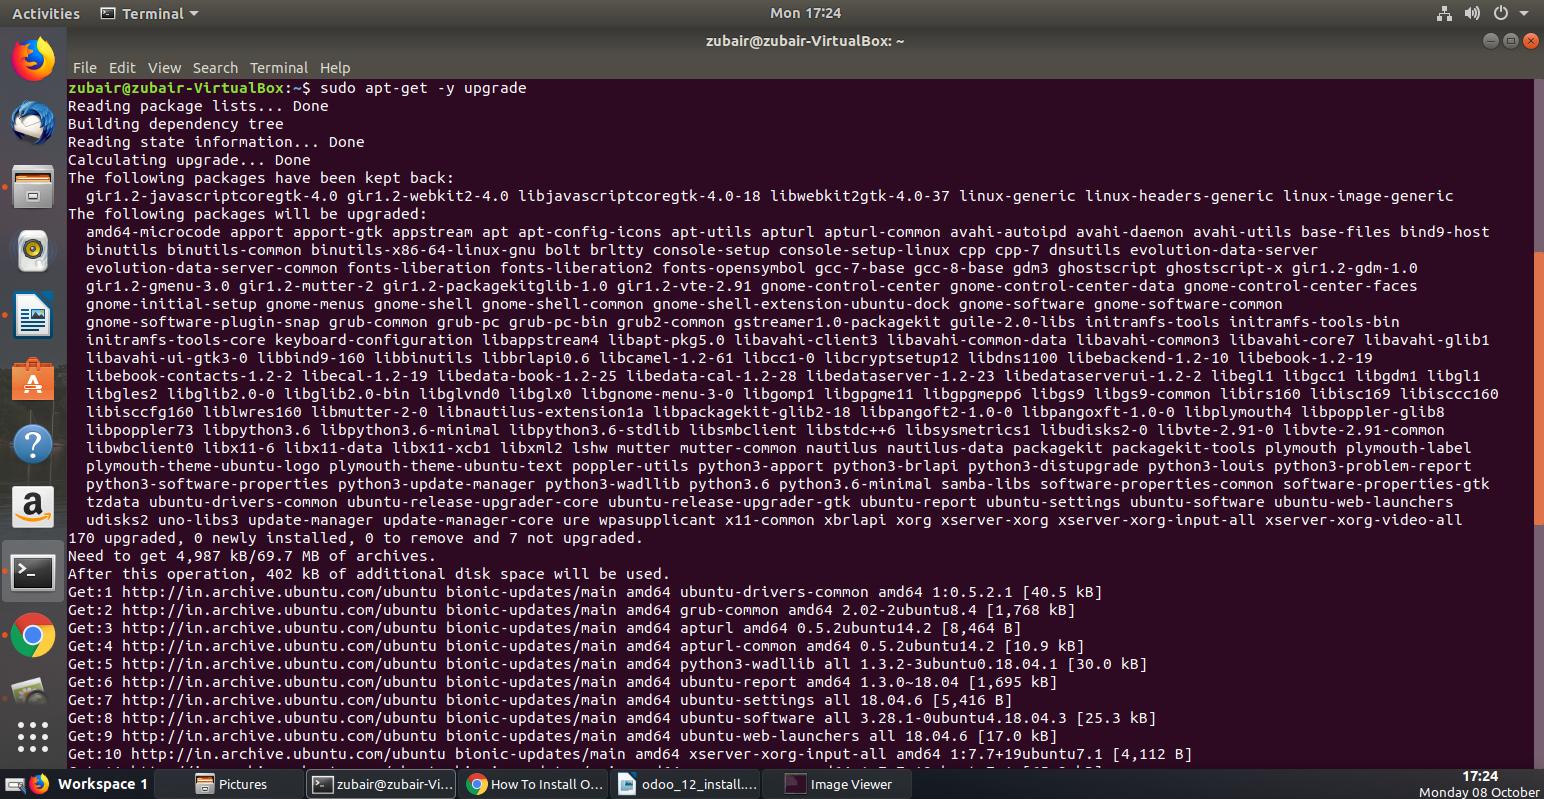 Odoo 12 Install - Installation guide on How to install Odoo 12 on Ubuntu